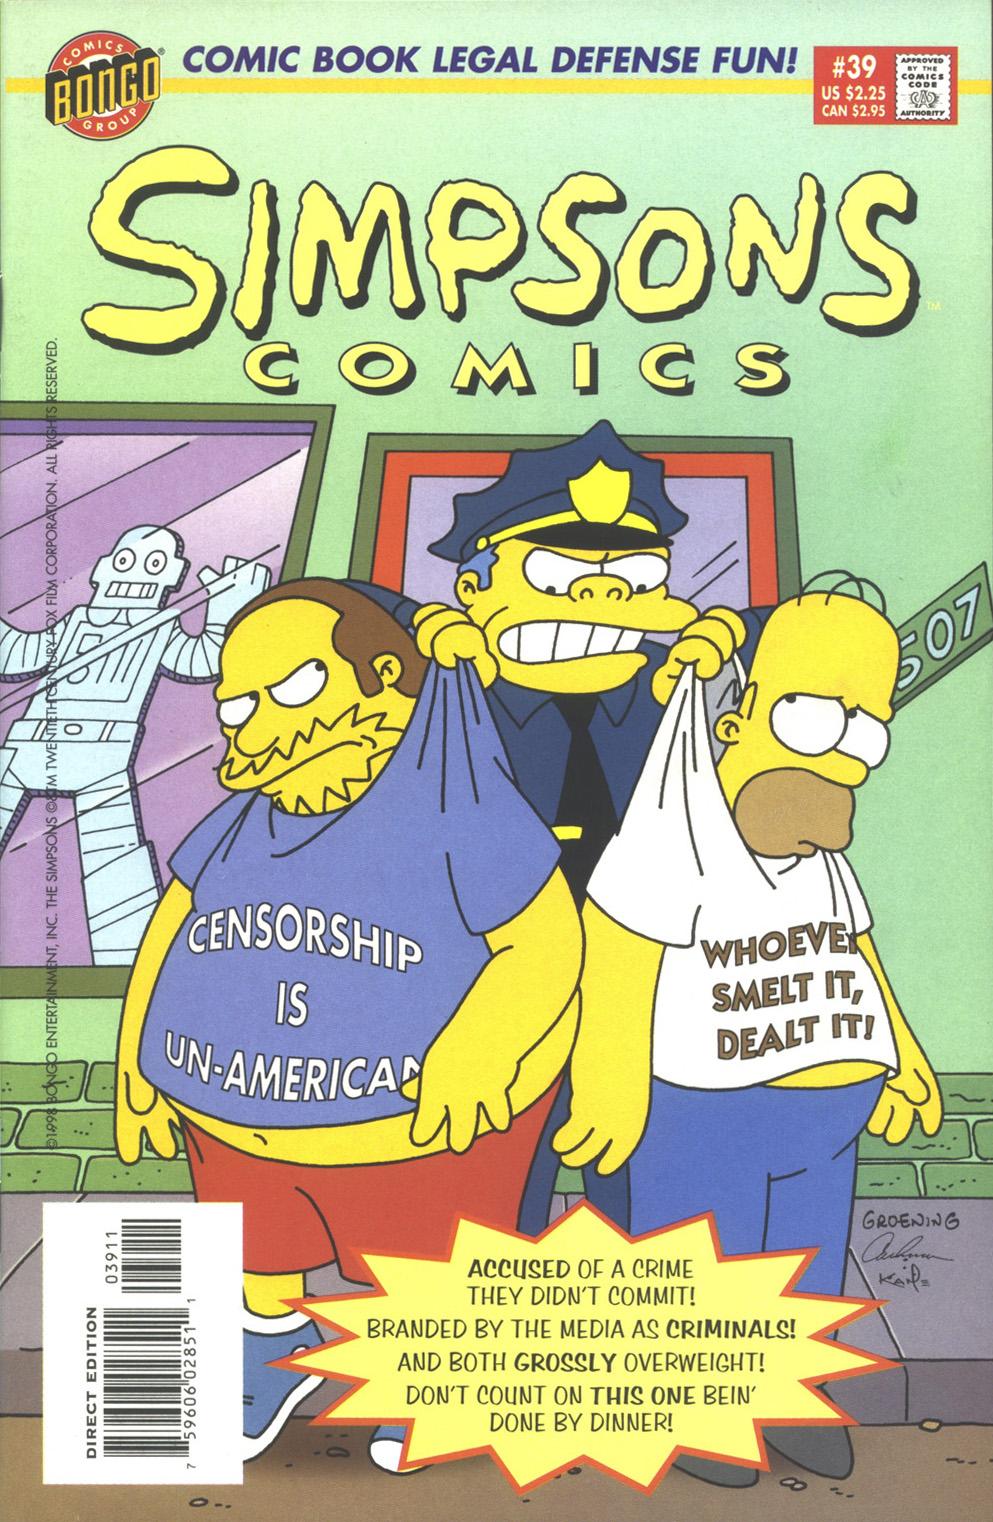 Read online Simpsons Comics comic -  Issue #39 - 1